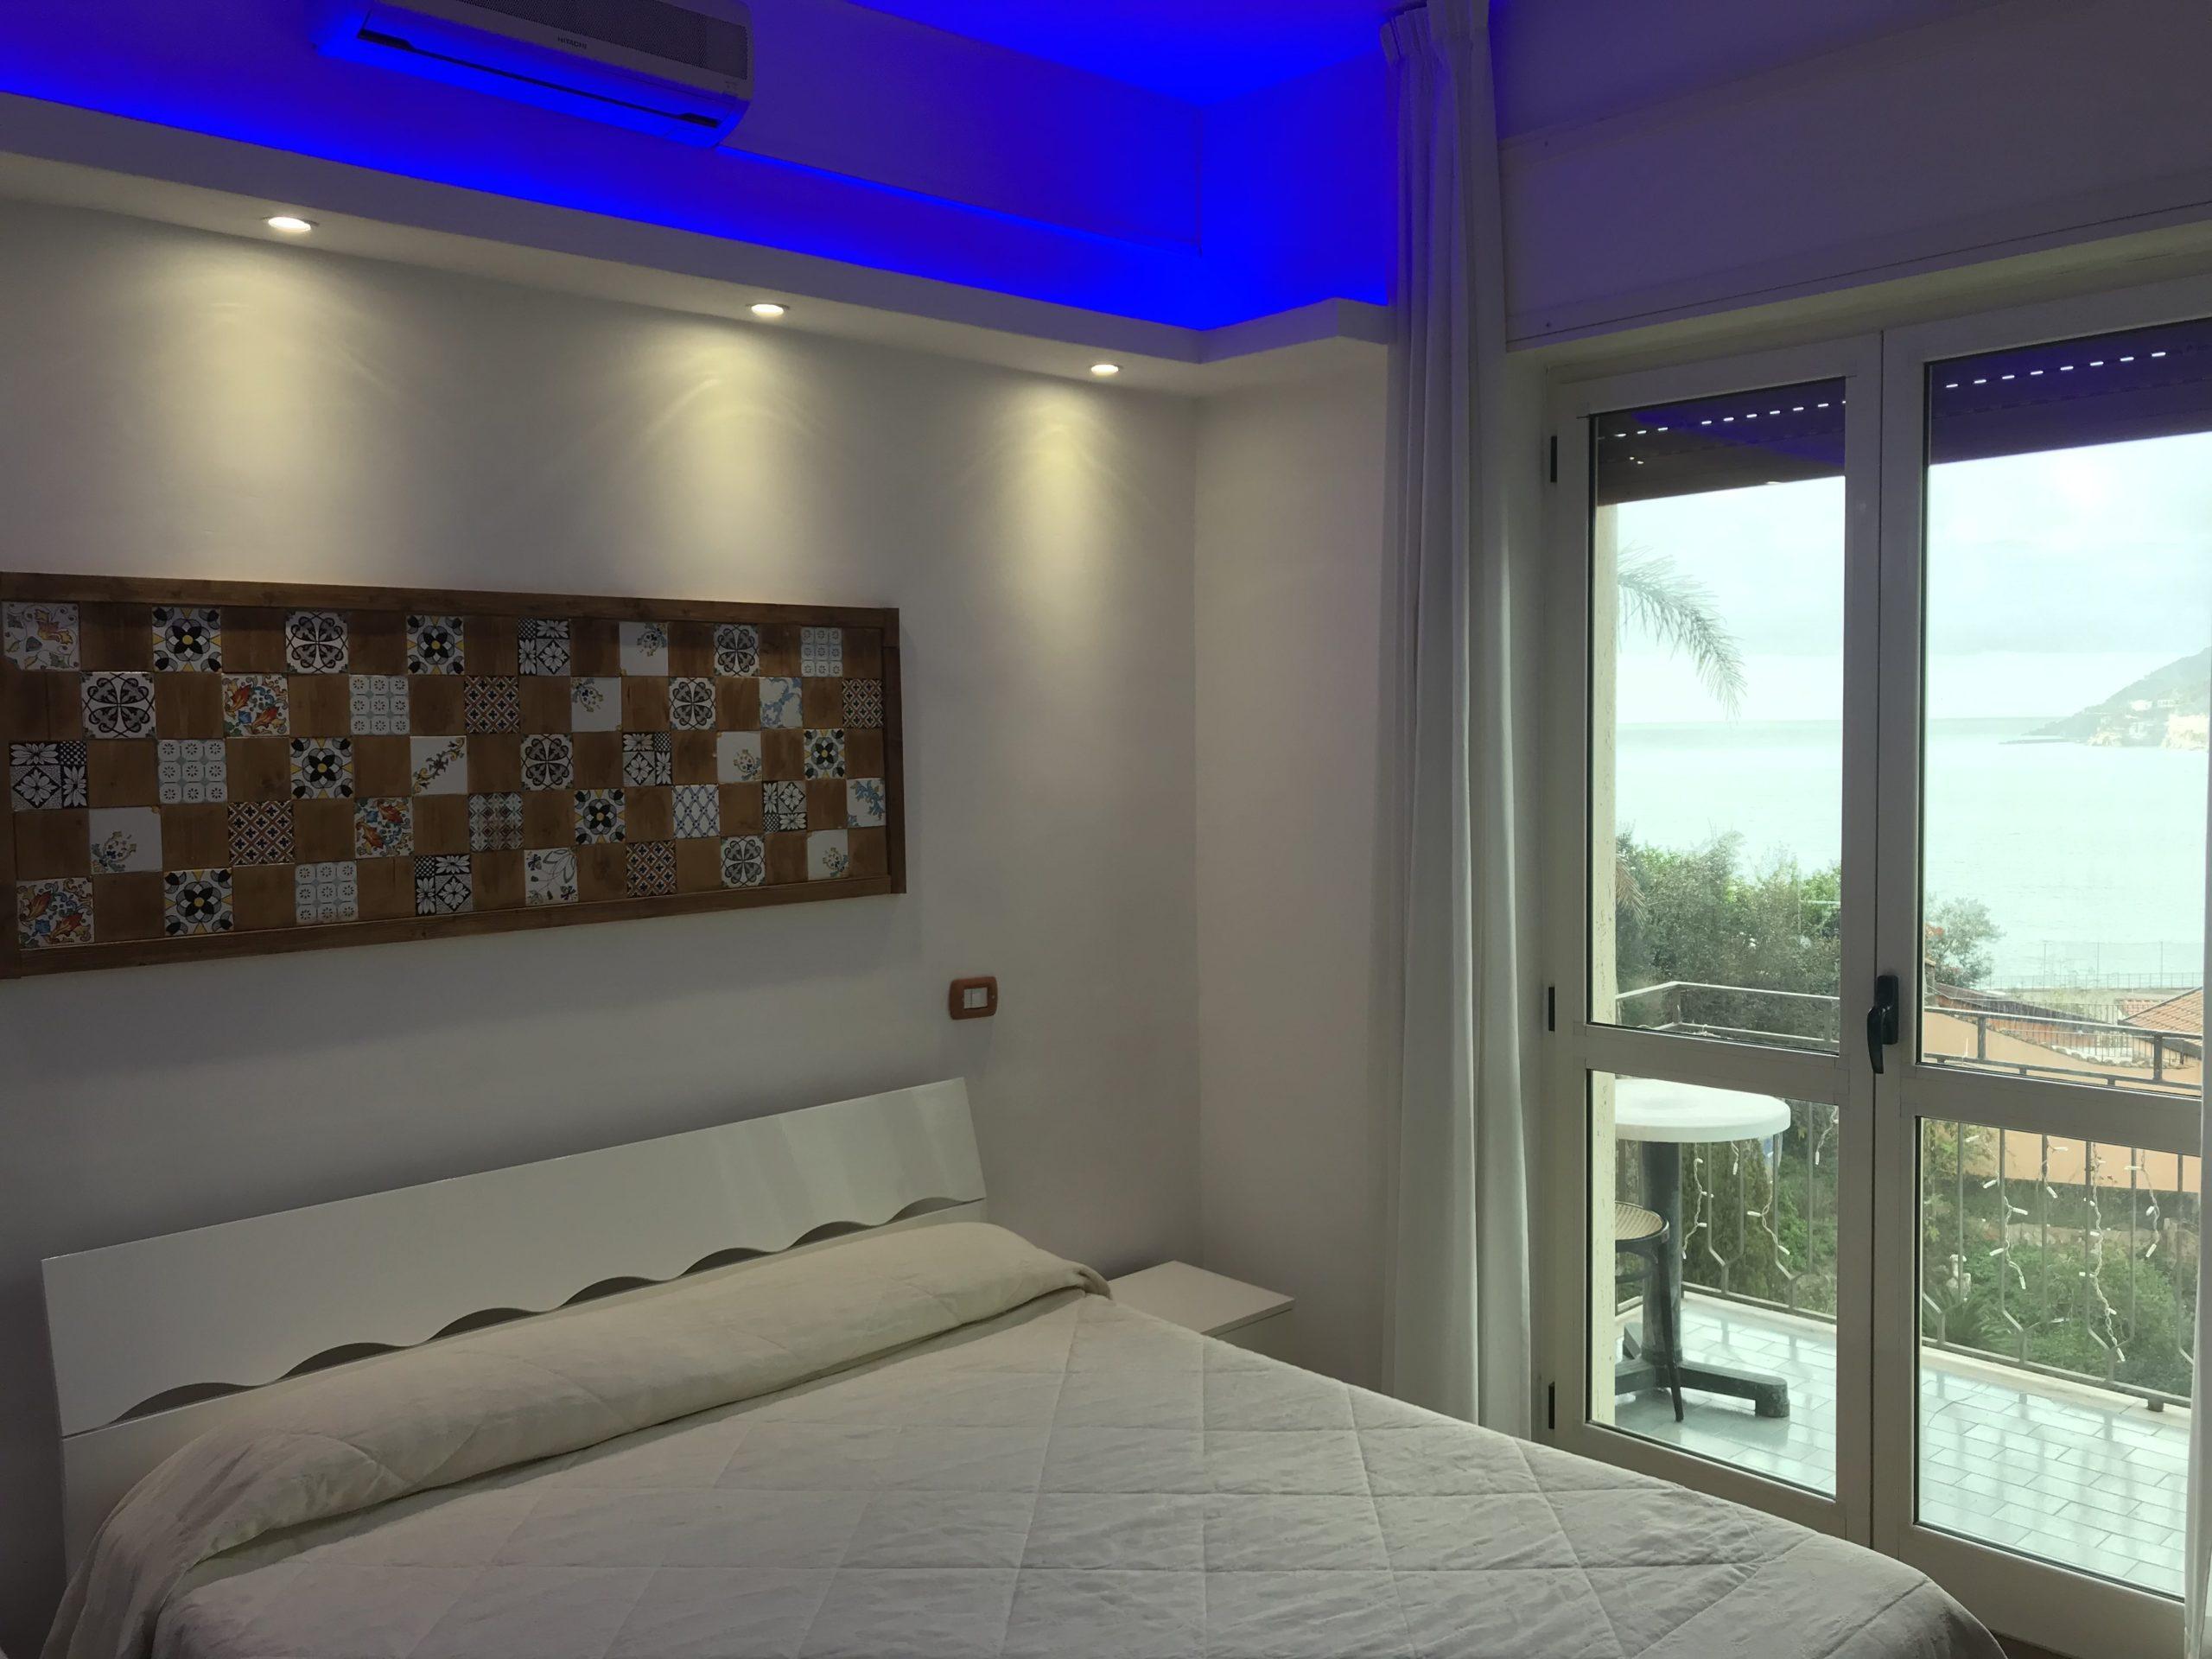 Camera Matrimoniale Fronte mare - Vietri Coast Hotel amlfi coast